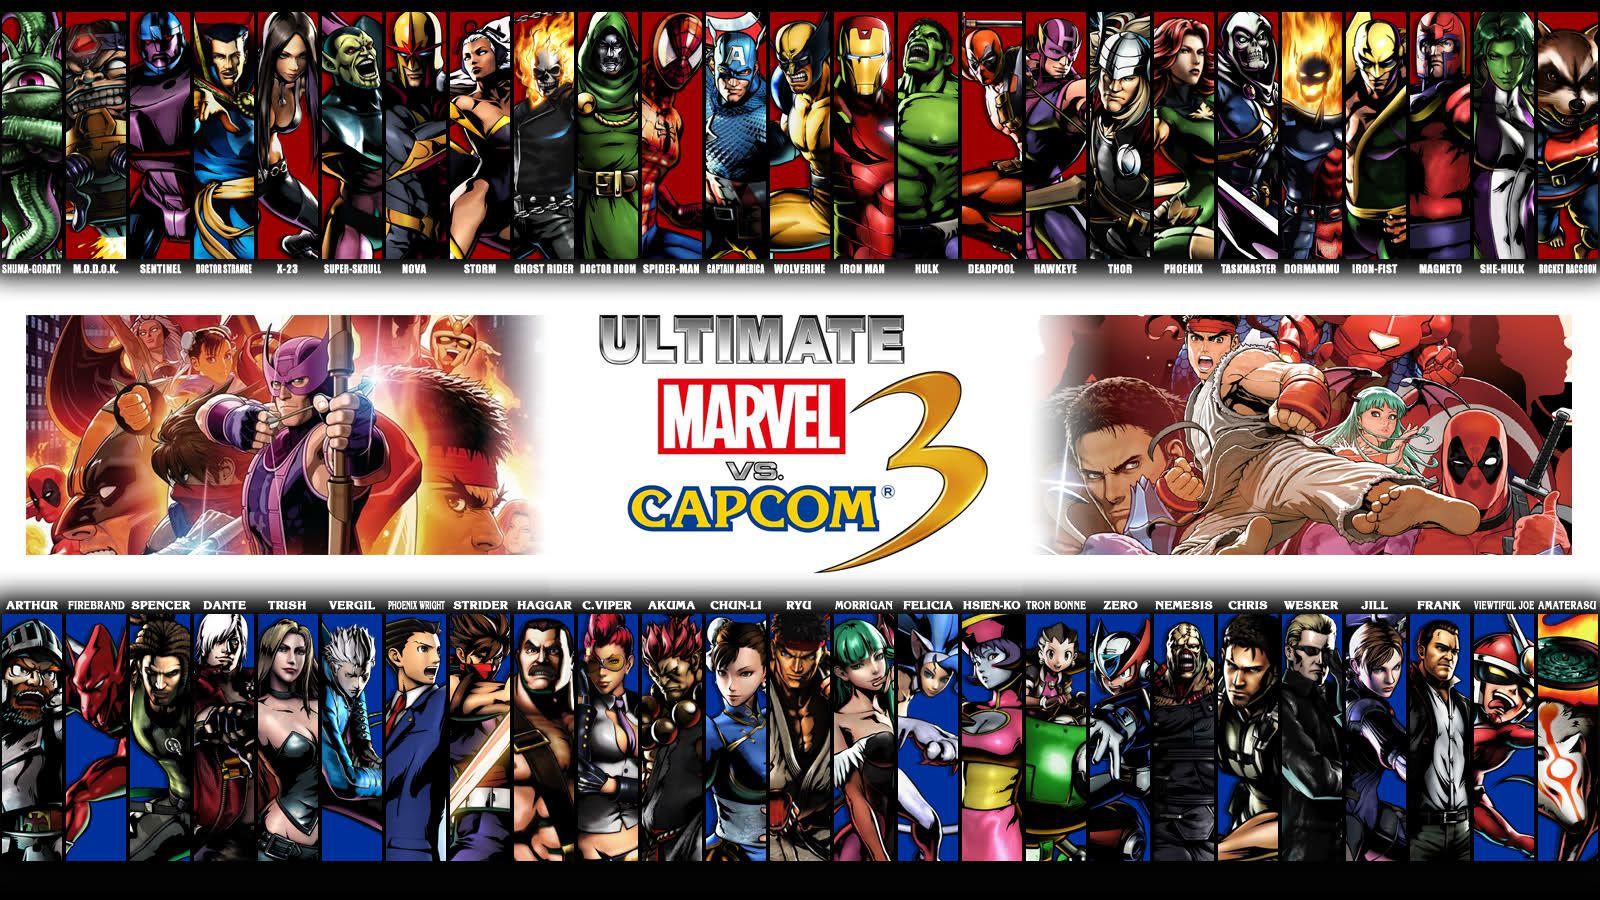 Ultimate Marvel vs Capcom 3 débarque sur PS4